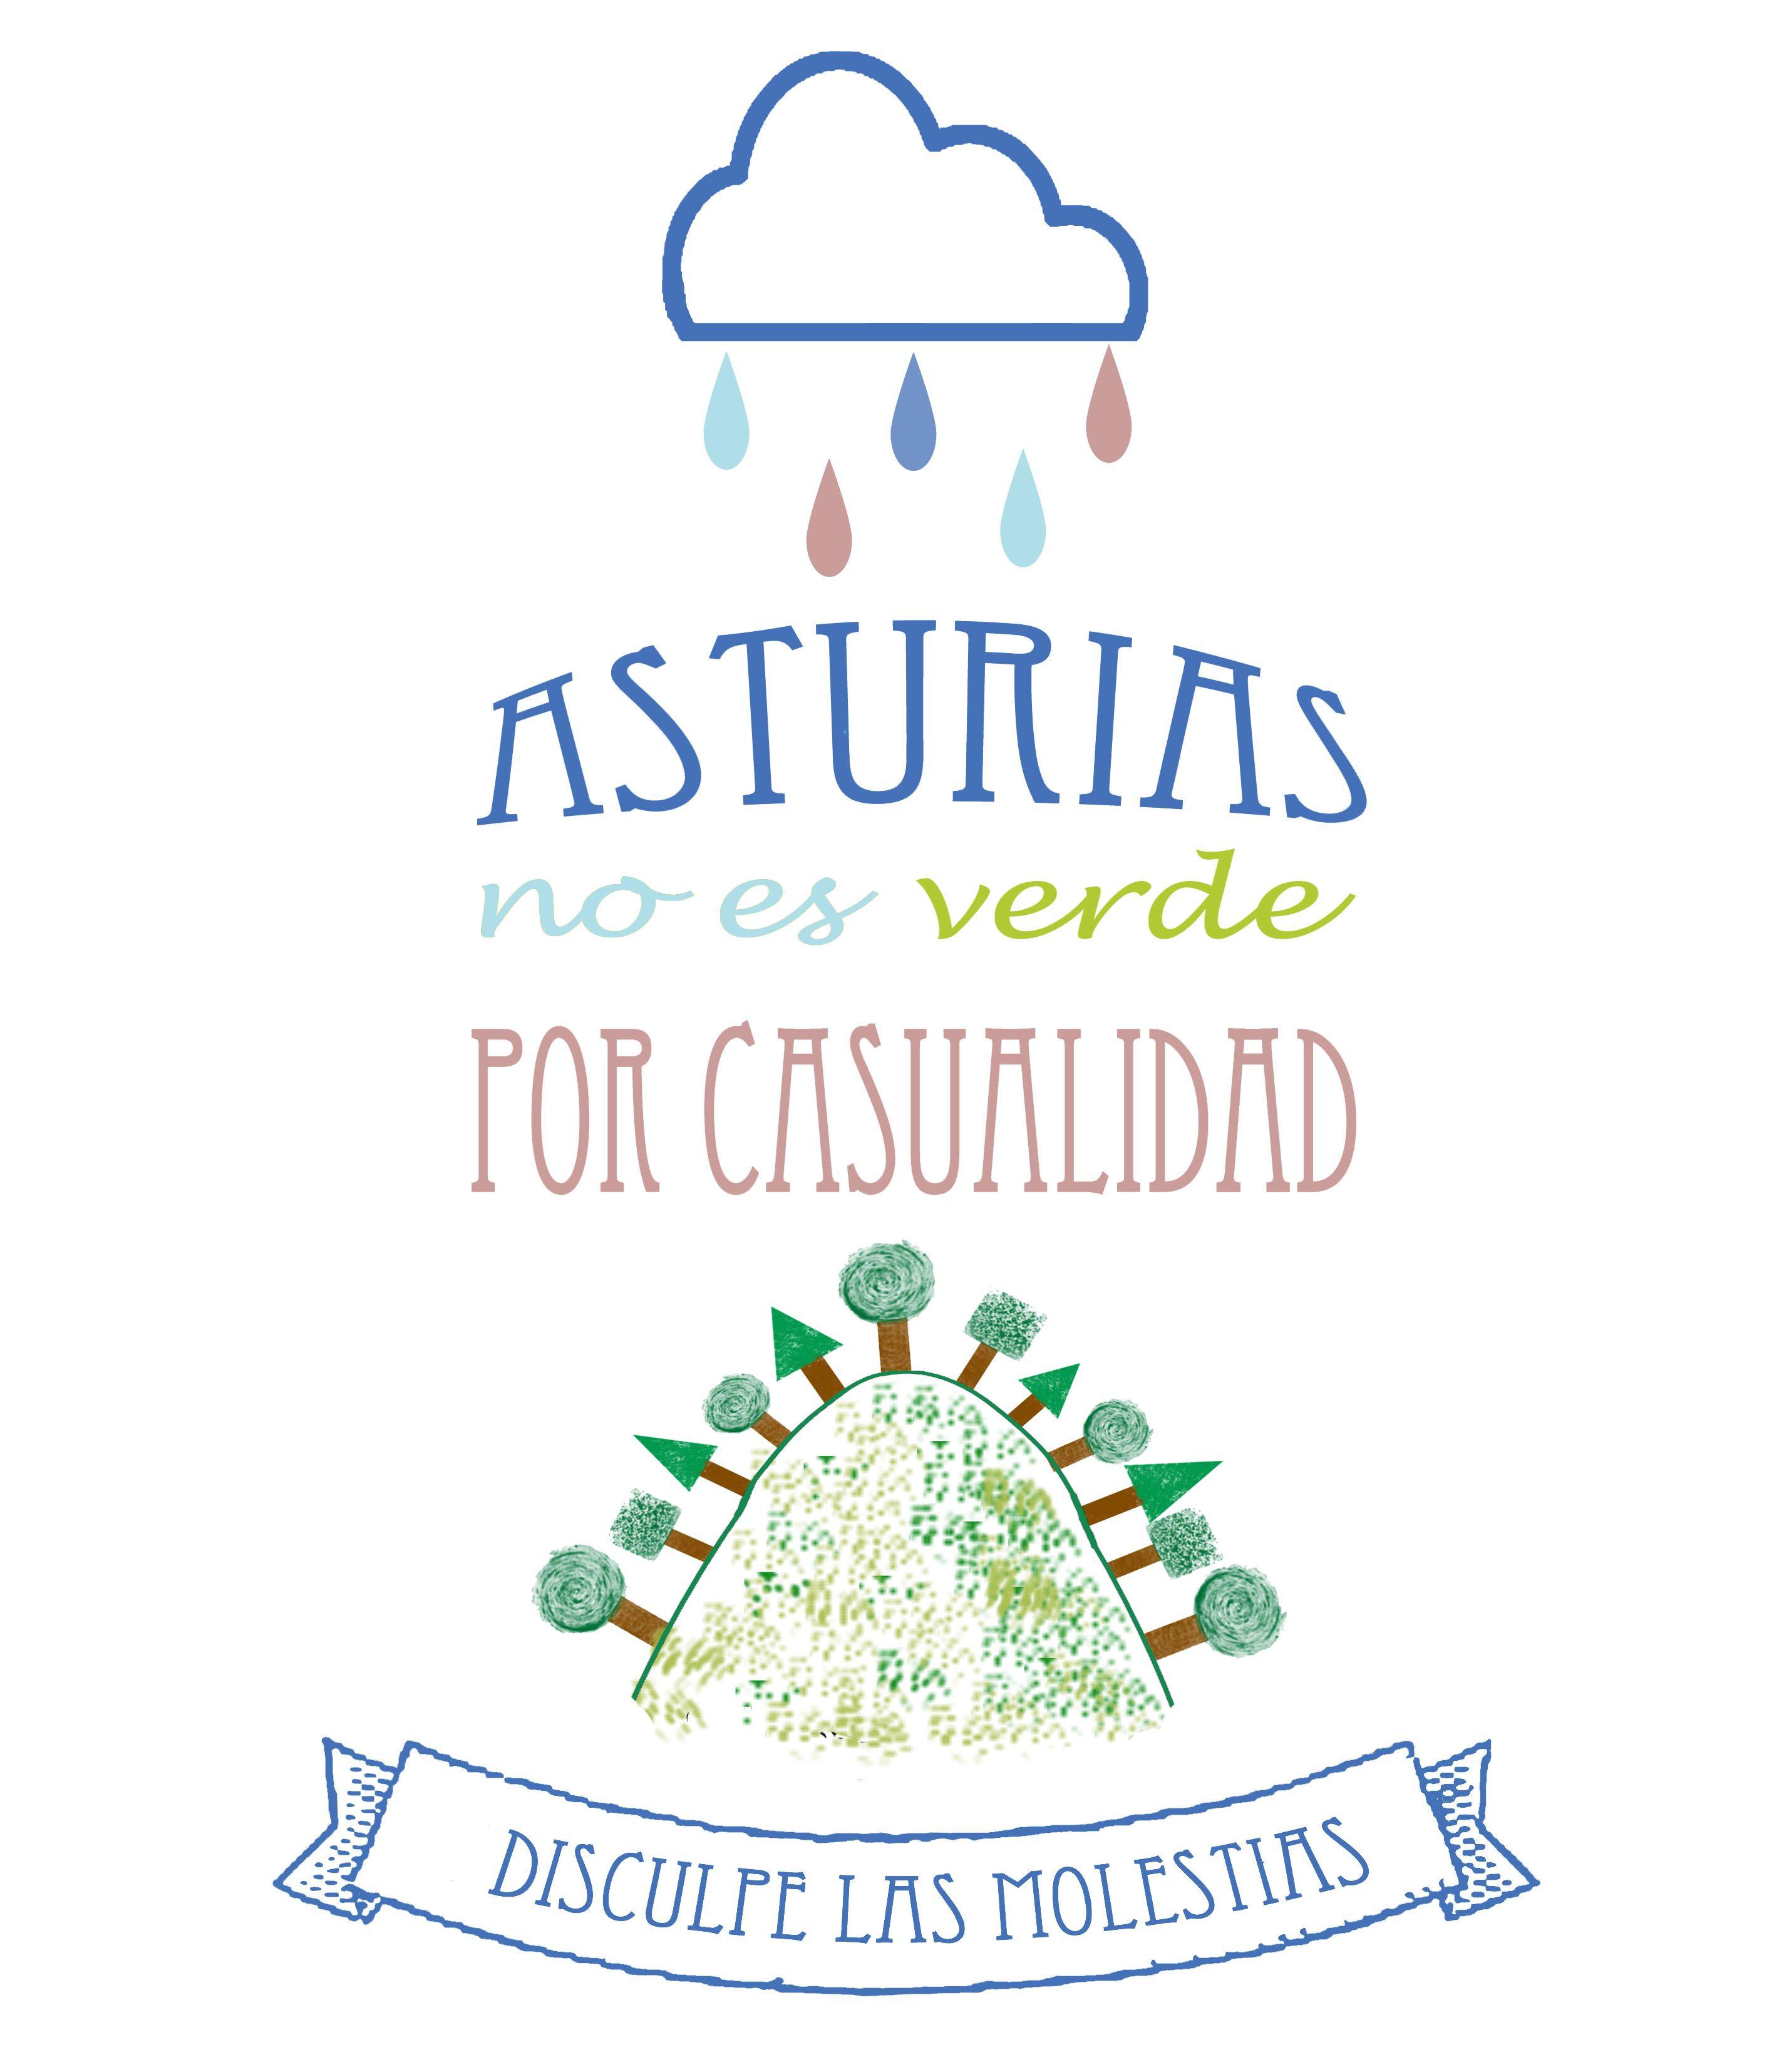 Resultado de imagen de frase asturias verde